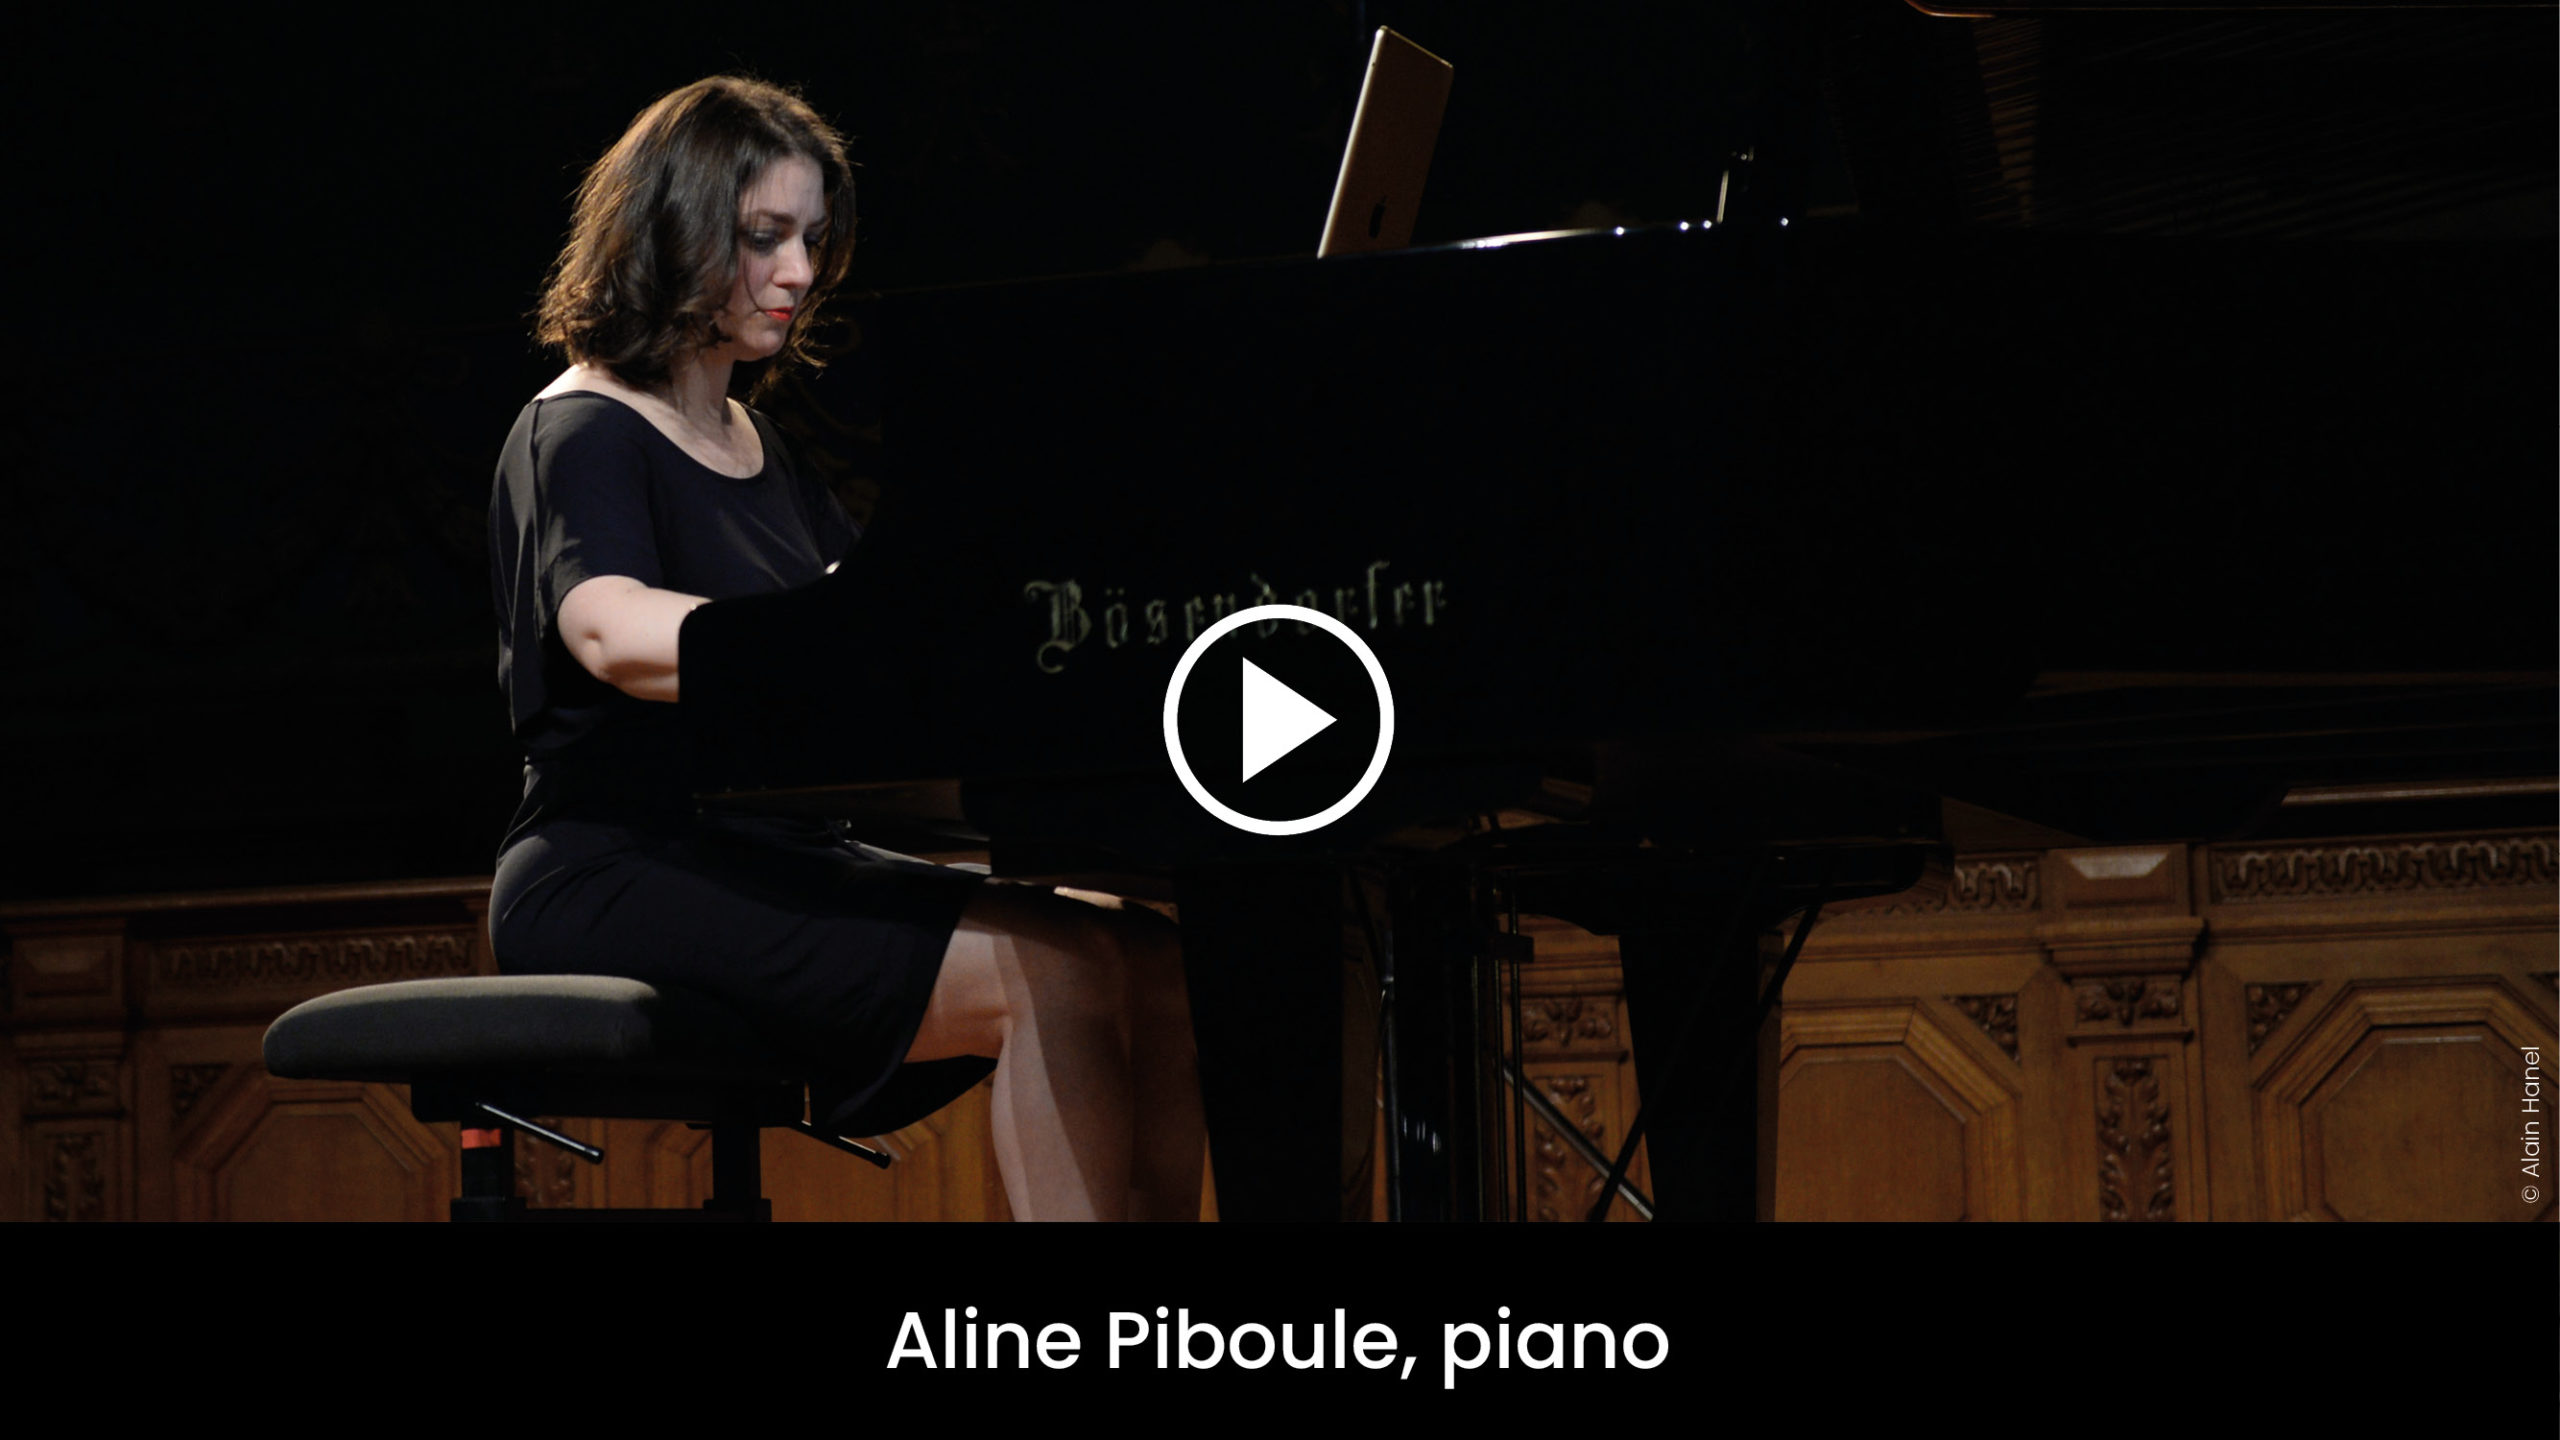 Aline Piboule, piano